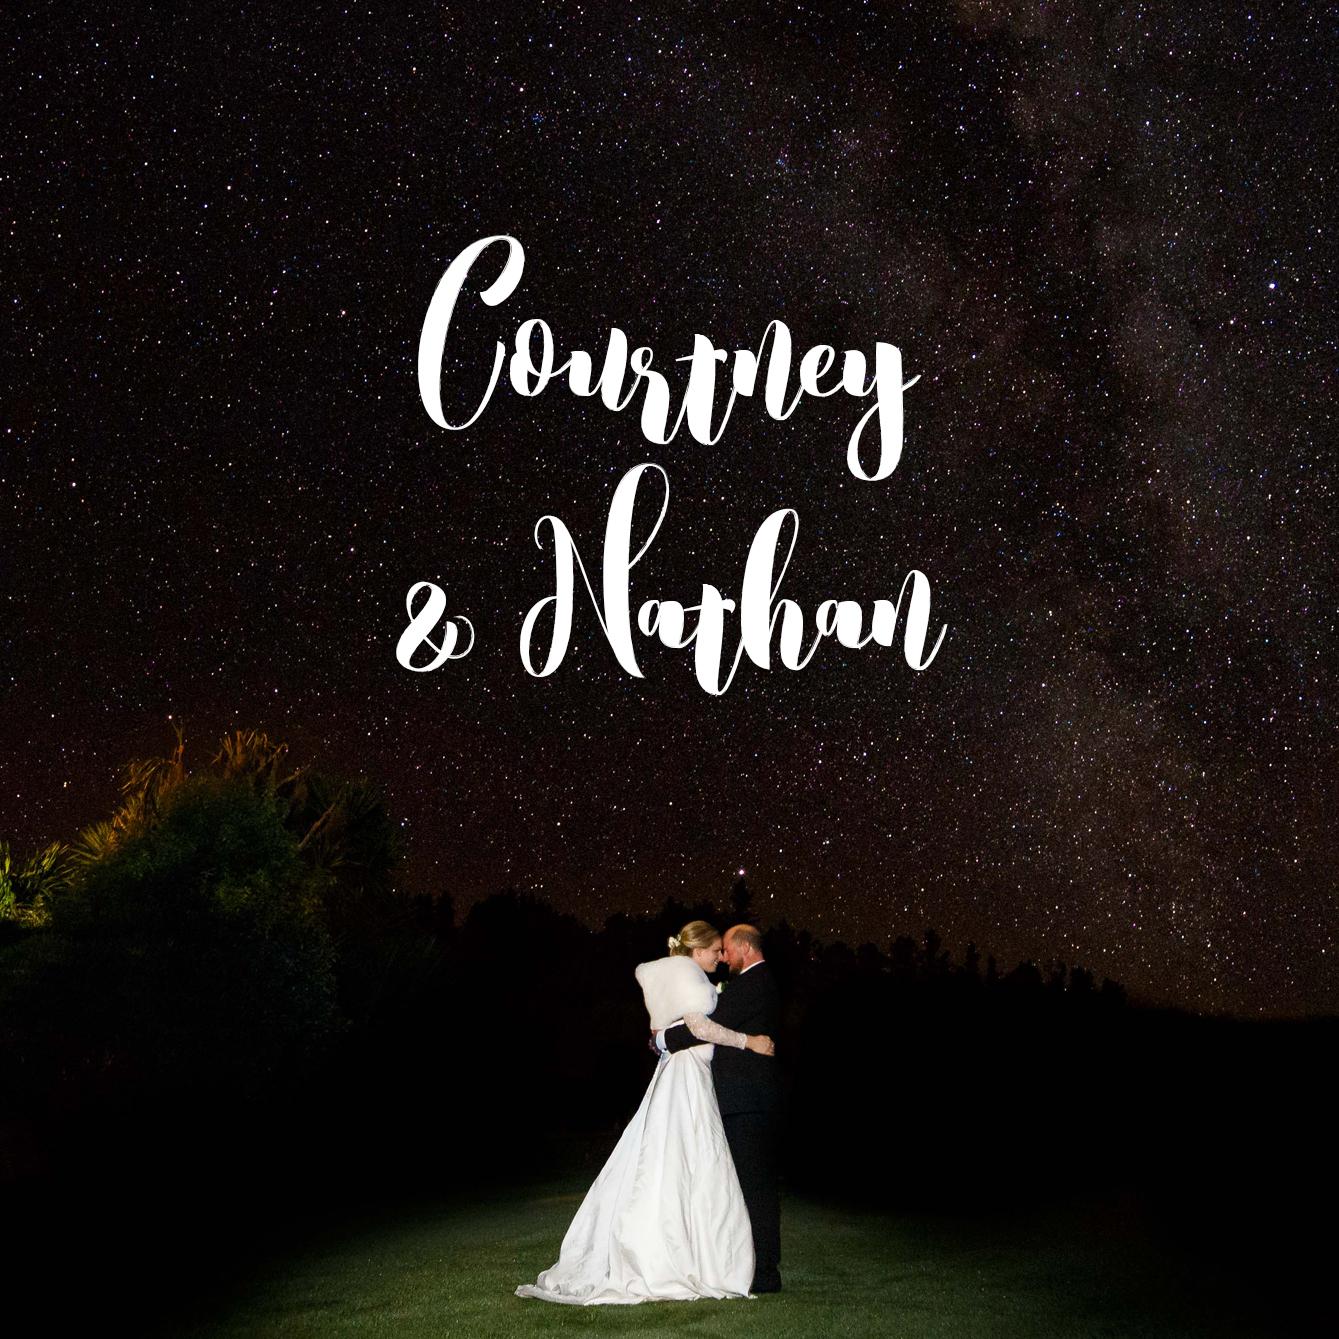 CourtneyNathan.jpg